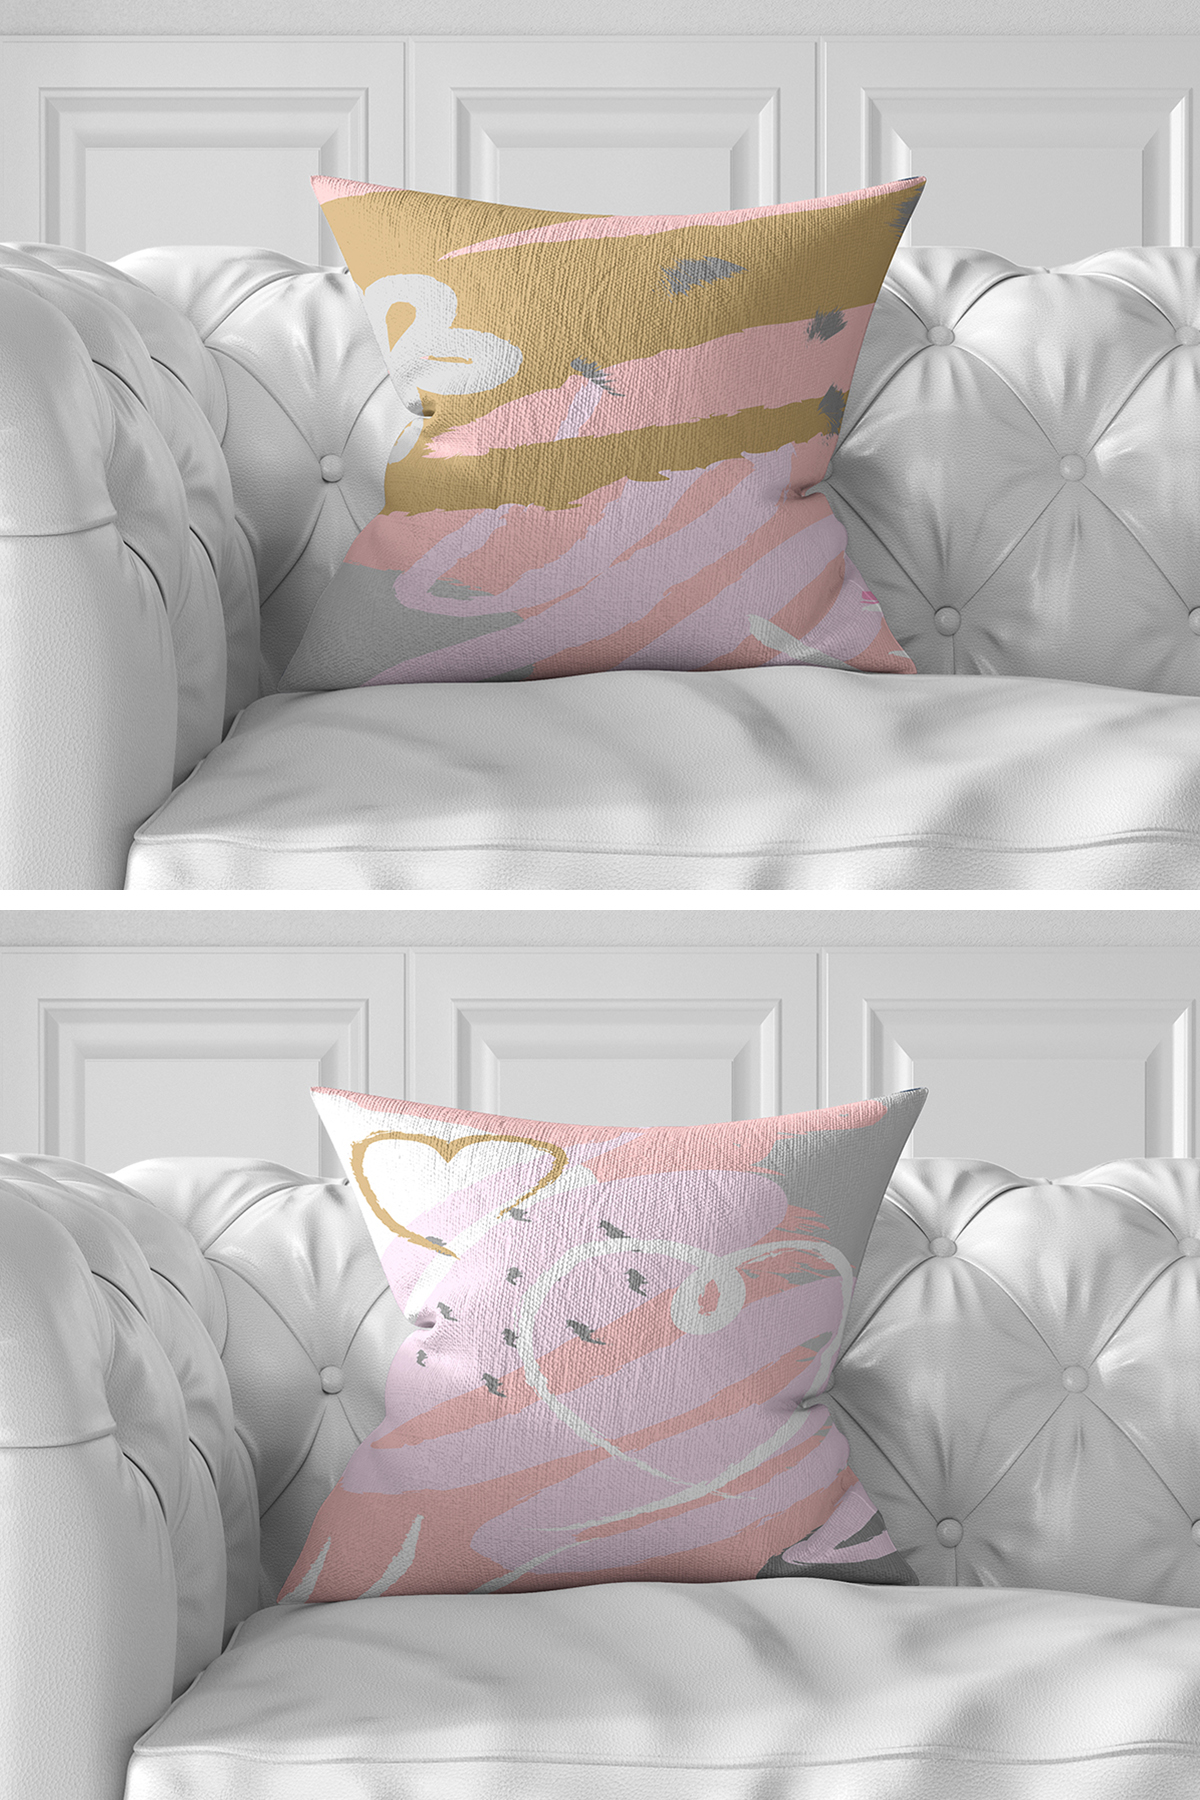 7'li Pembe Renkli Pastel Çizimli Dijital Baskılı Kırlent Kılıfı Seti Realhomes